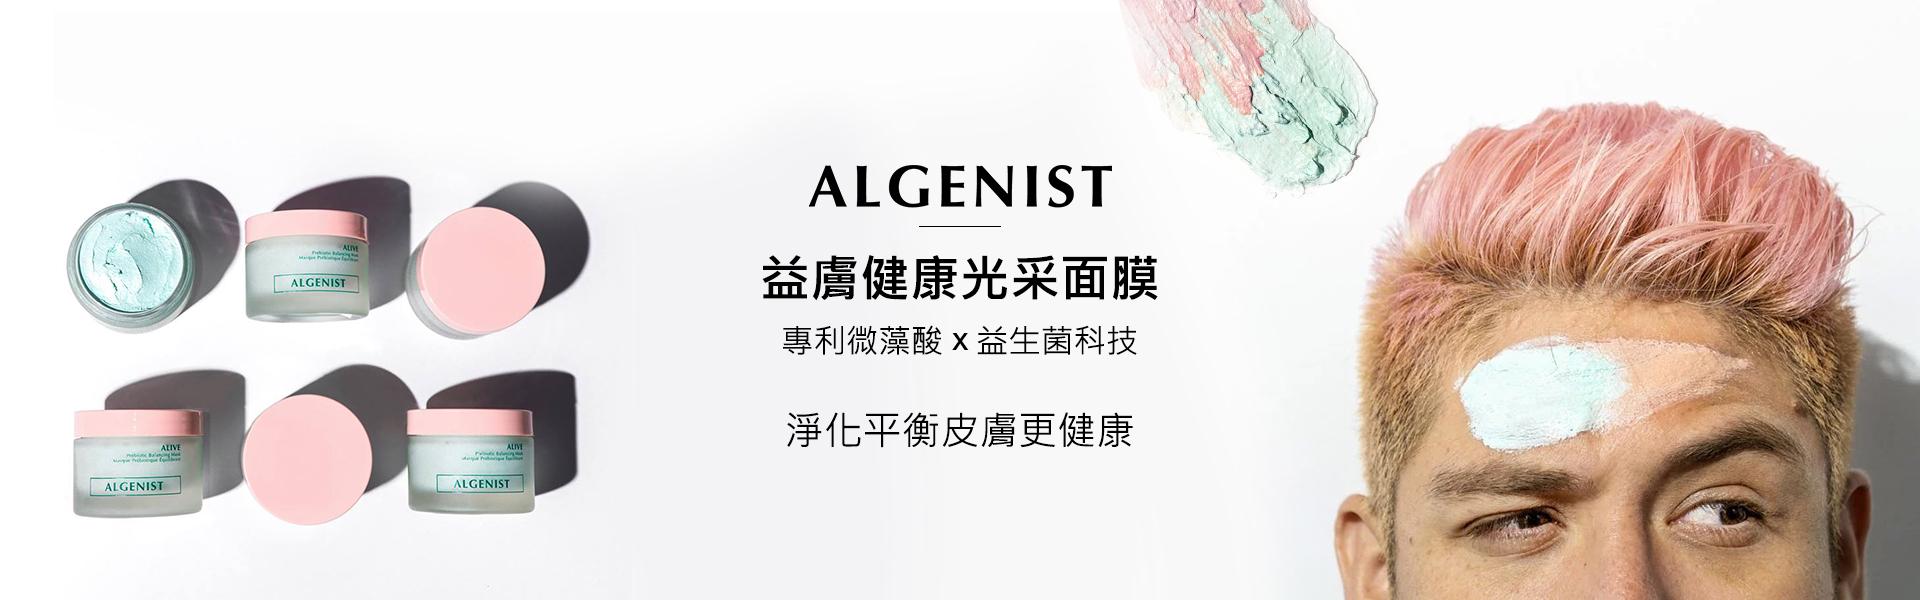 Algenist 益膚健康光采面膜 50ml